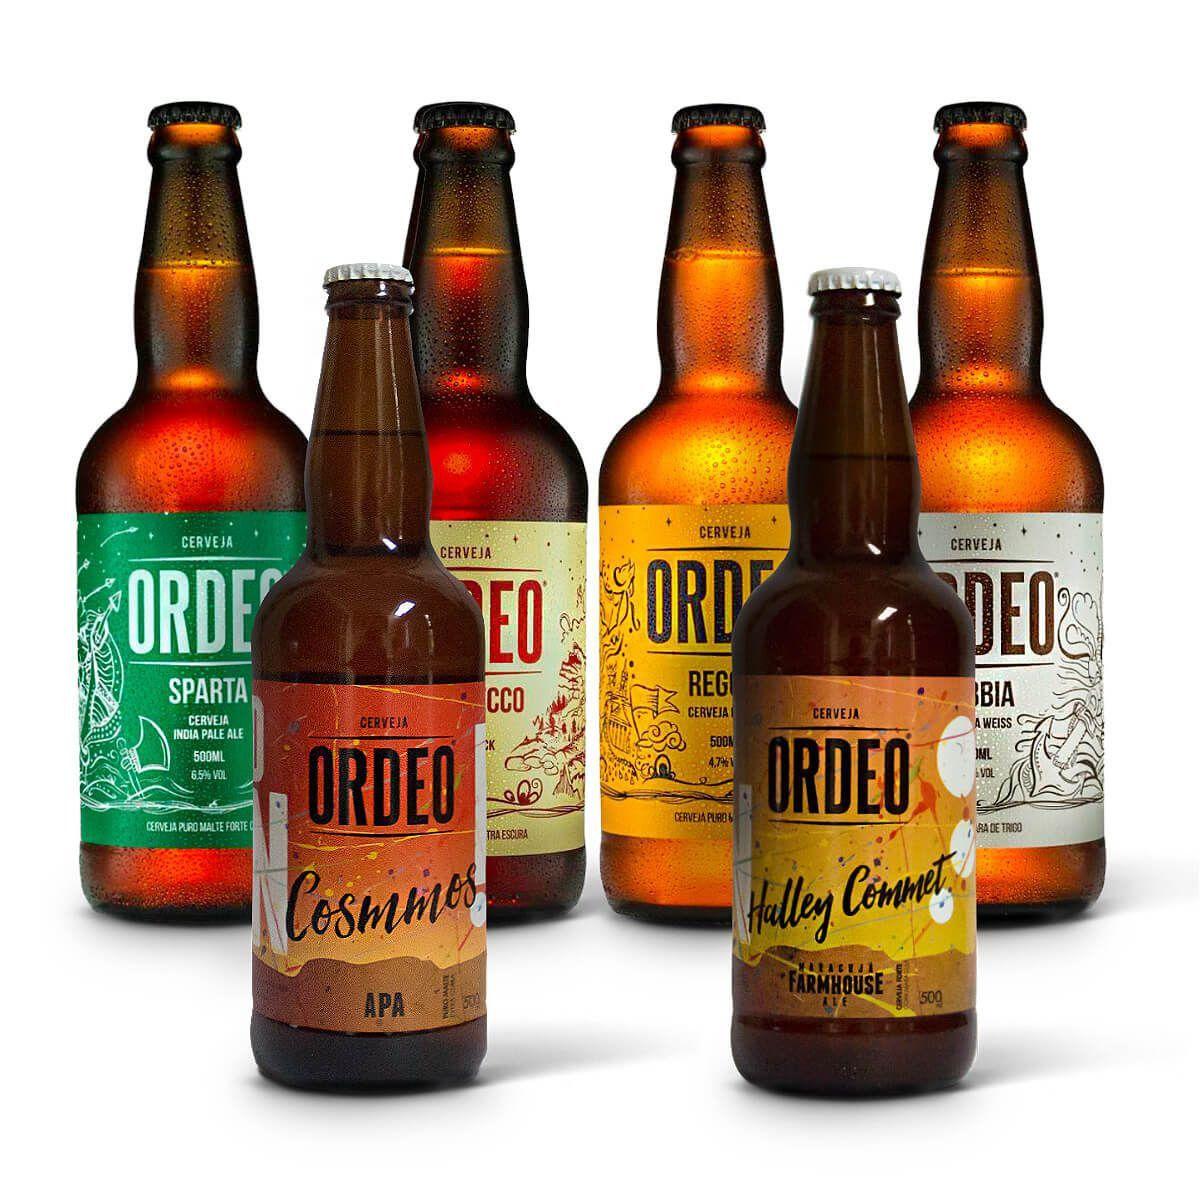 Kit degustação Ordeo 6 cervejas  - RS BEER - Cervejas Gaúchas